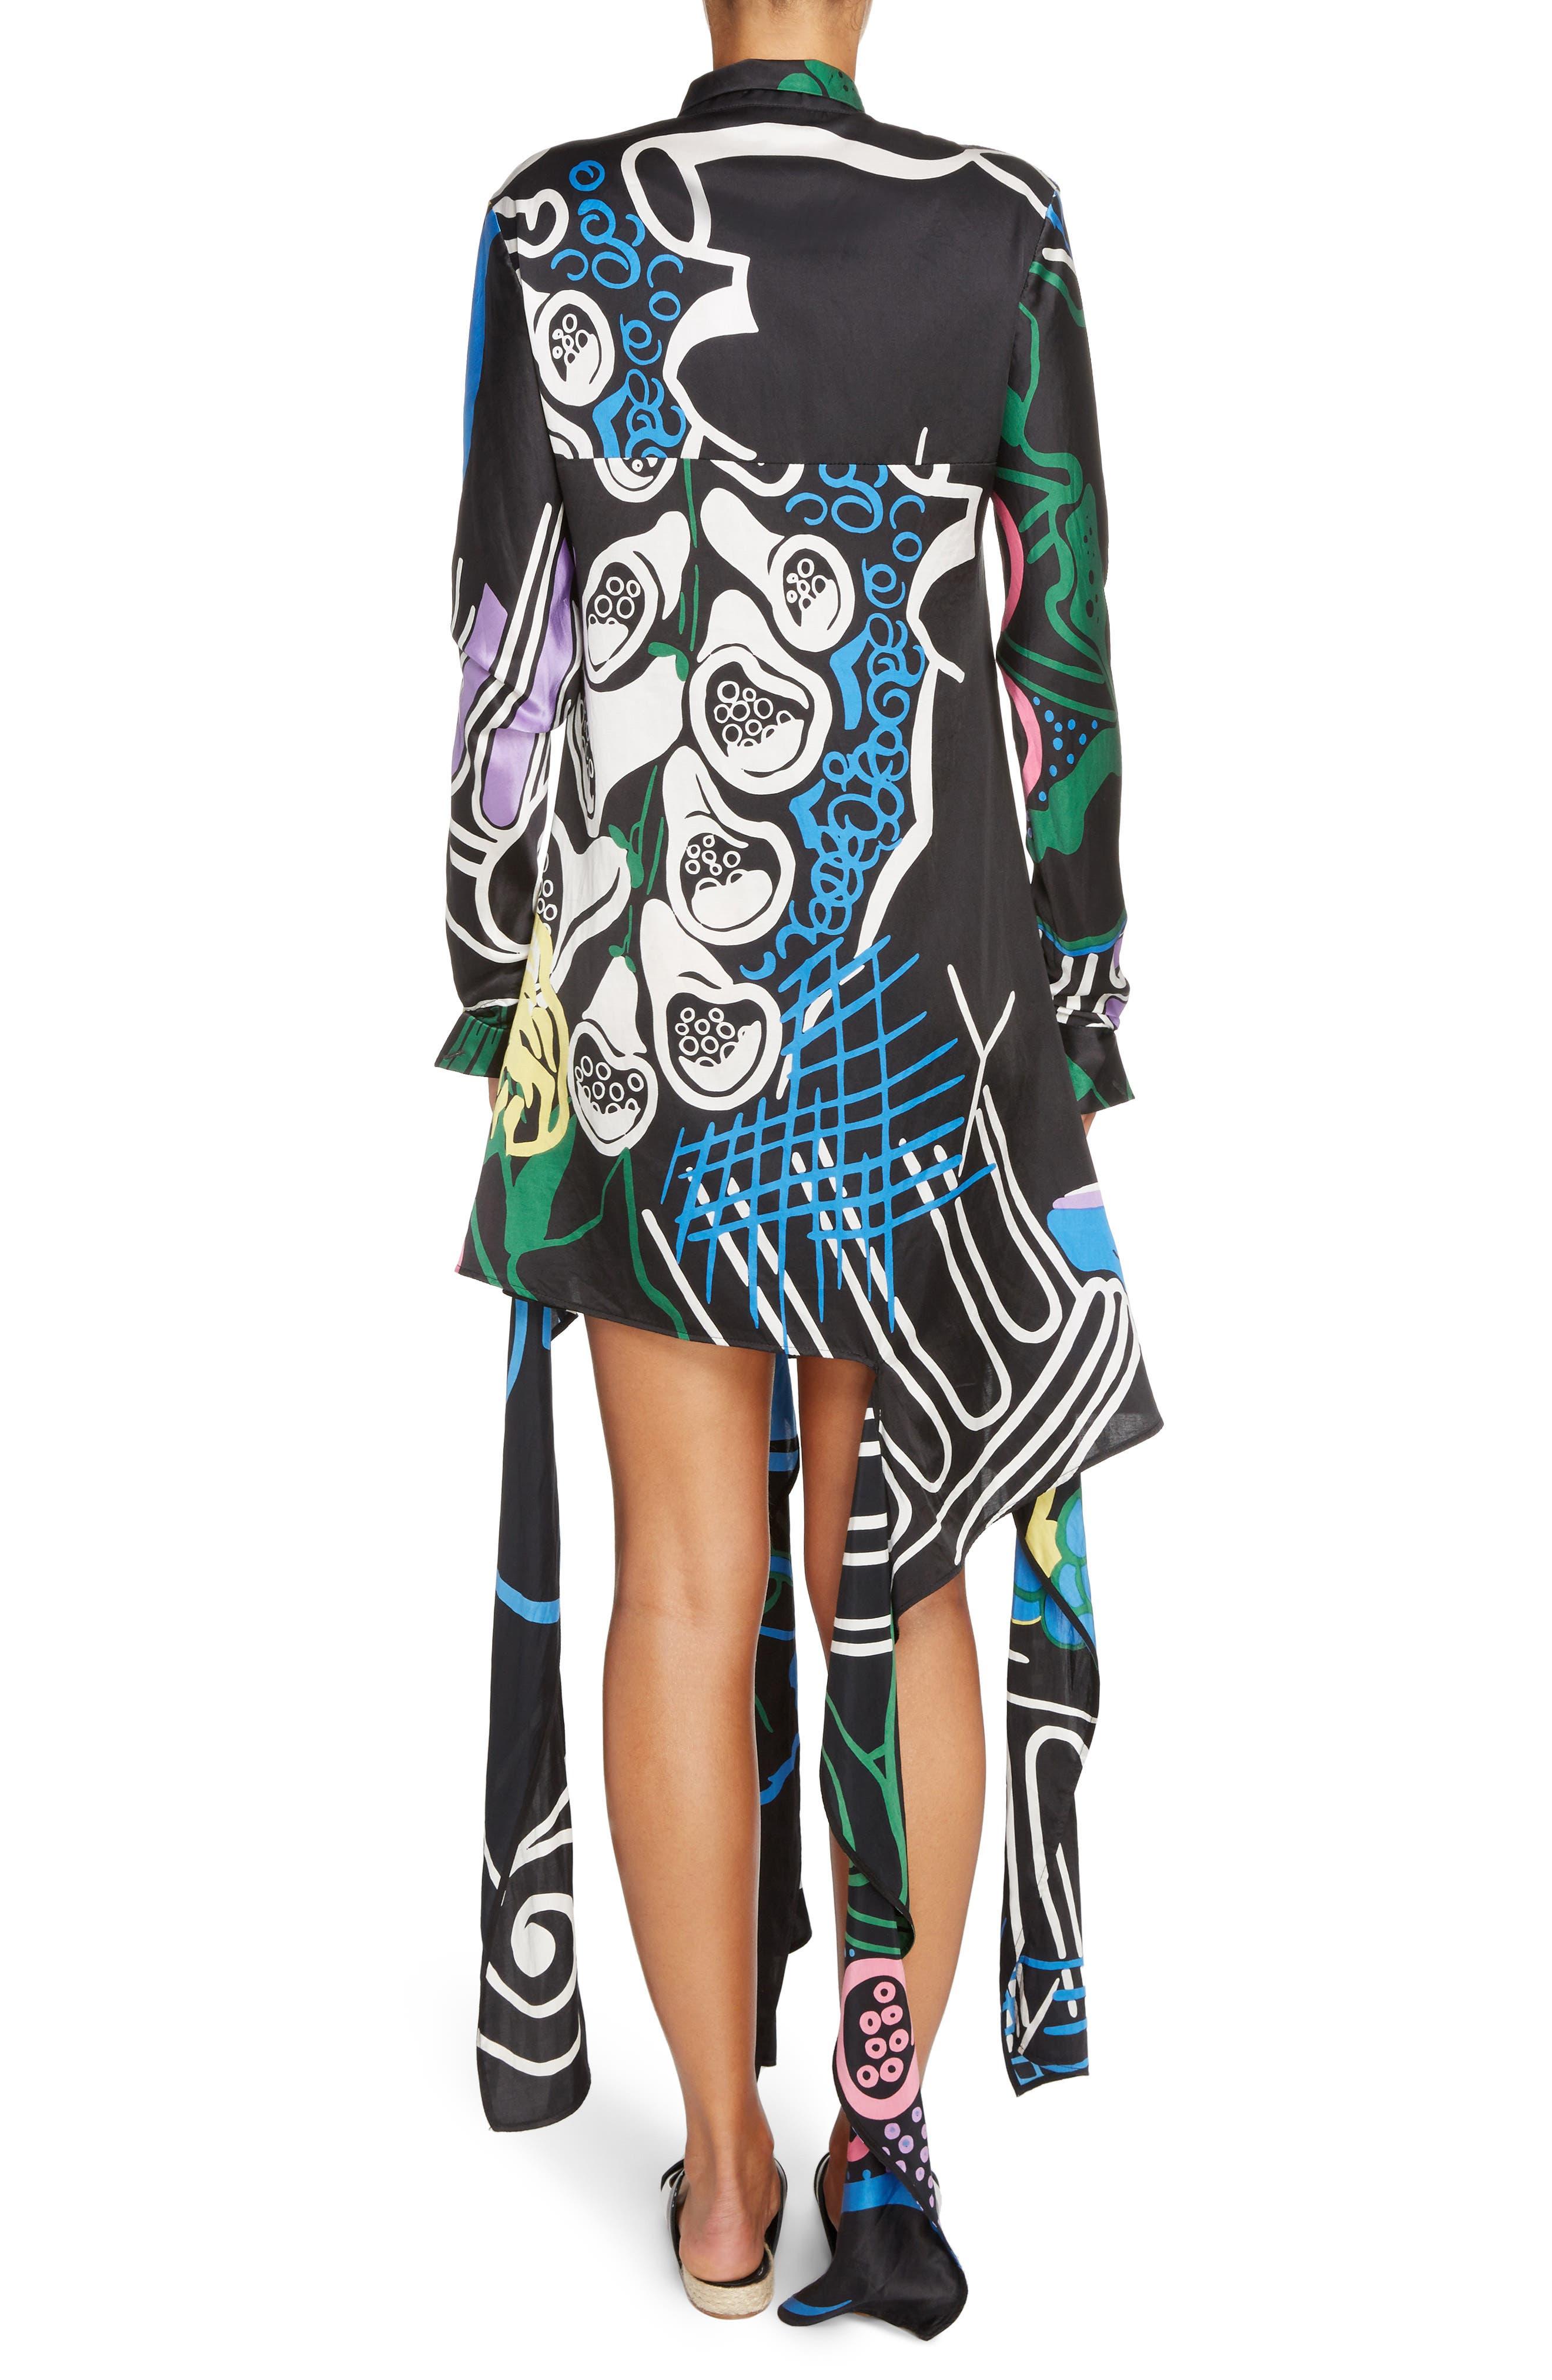 Foxglove Print Dress with Ribbon Detail,                             Alternate thumbnail 2, color,                             Black Foxglove Print